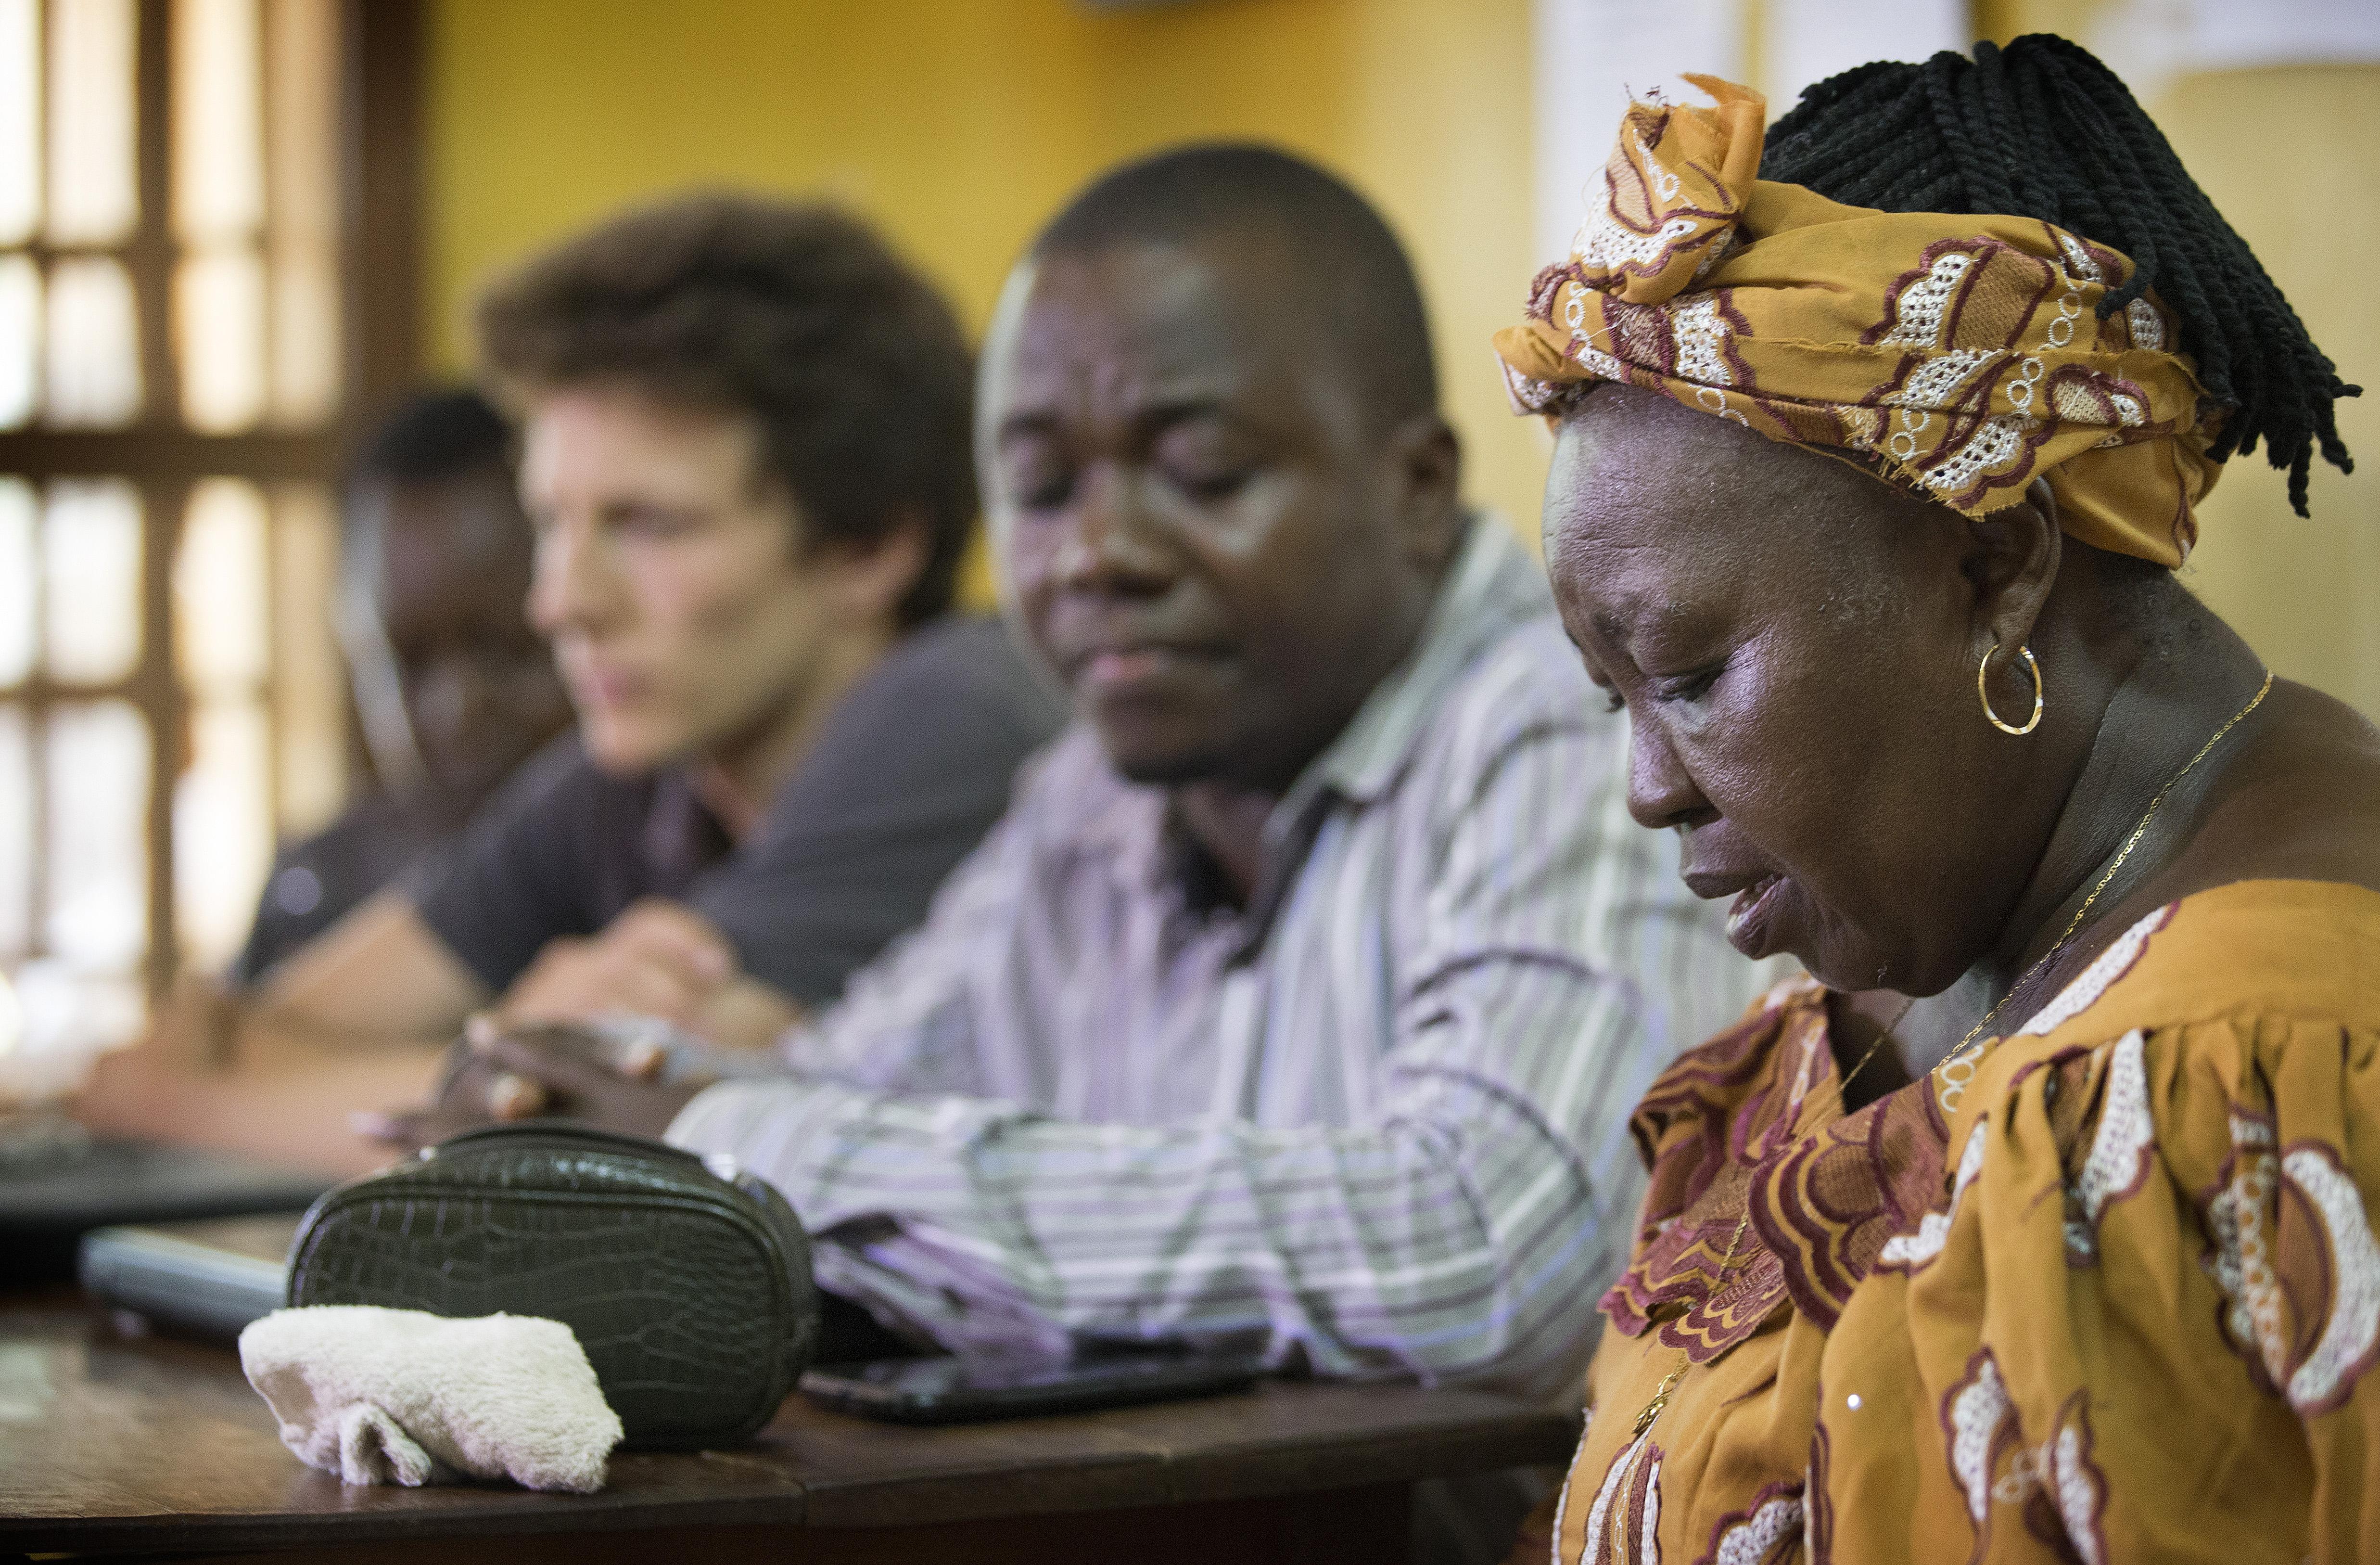 In Sierra Leone, Beatrice Gbanga leads of prayer at the United Methodist Church's Mercy Hospital in Sierra Leone. Photo by Mike DuBose, UMNS